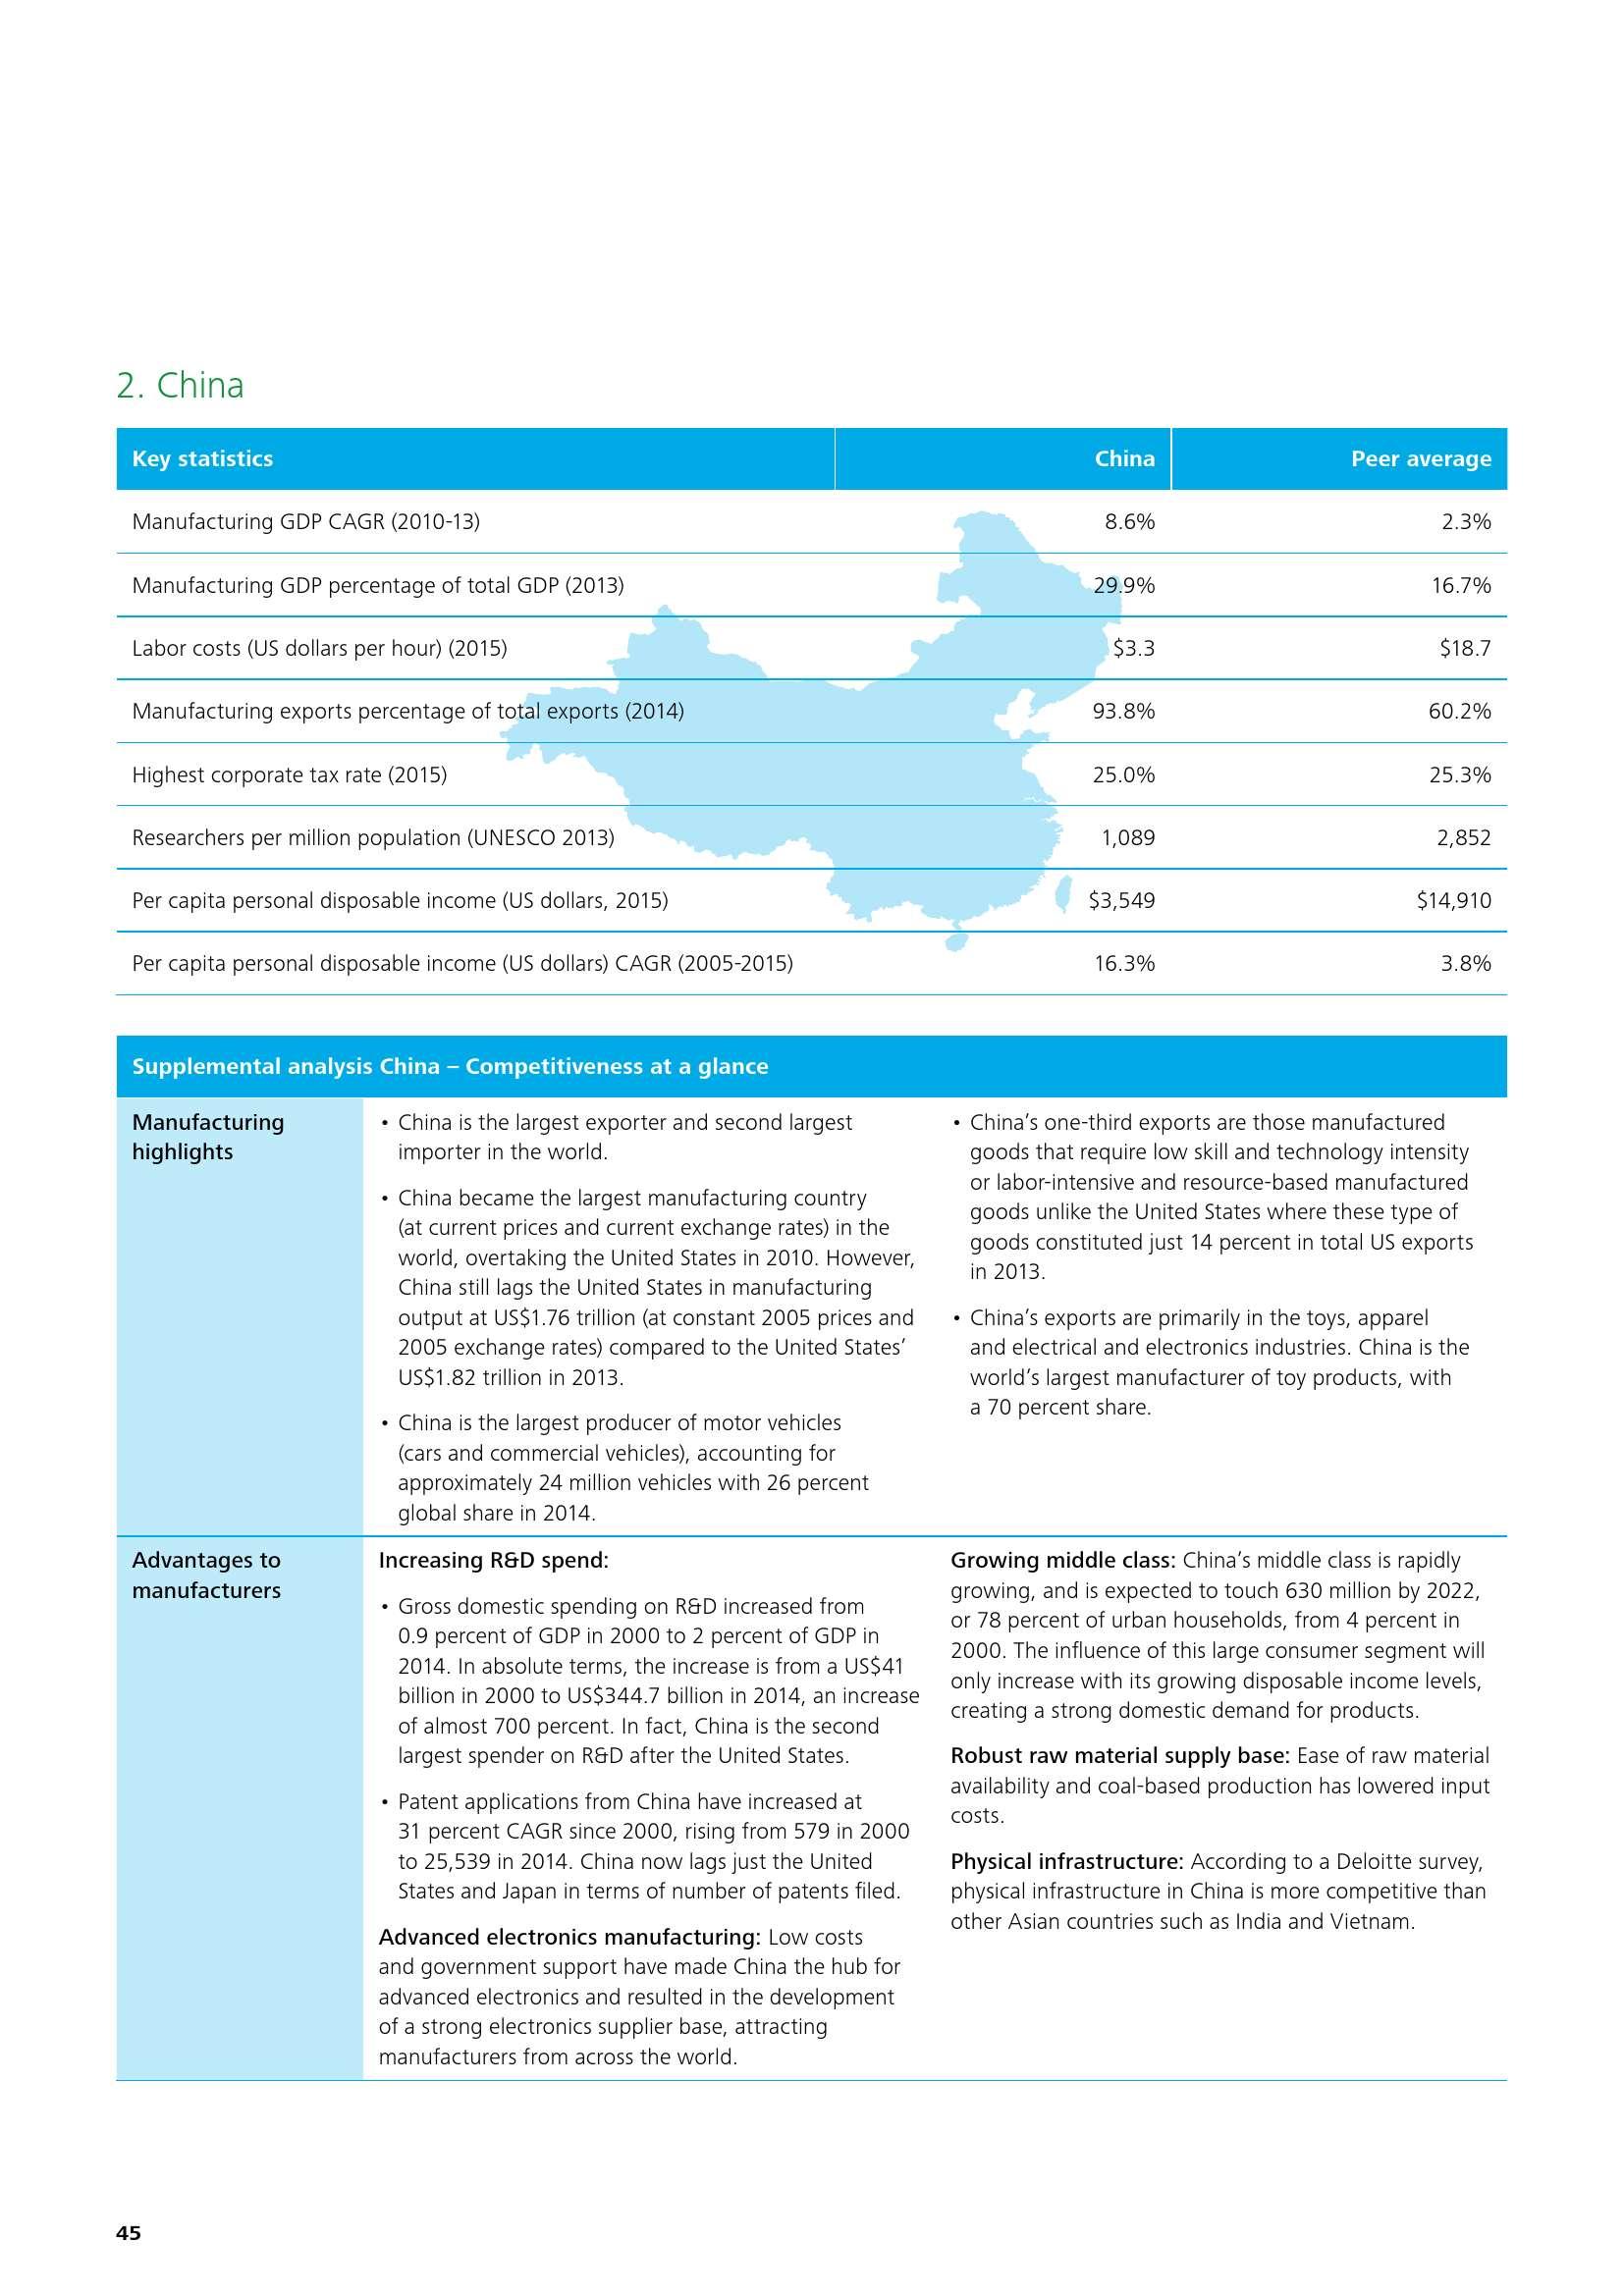 deloitte-cn-global-mfg-competitiveness-index-2016-en-160401_000048